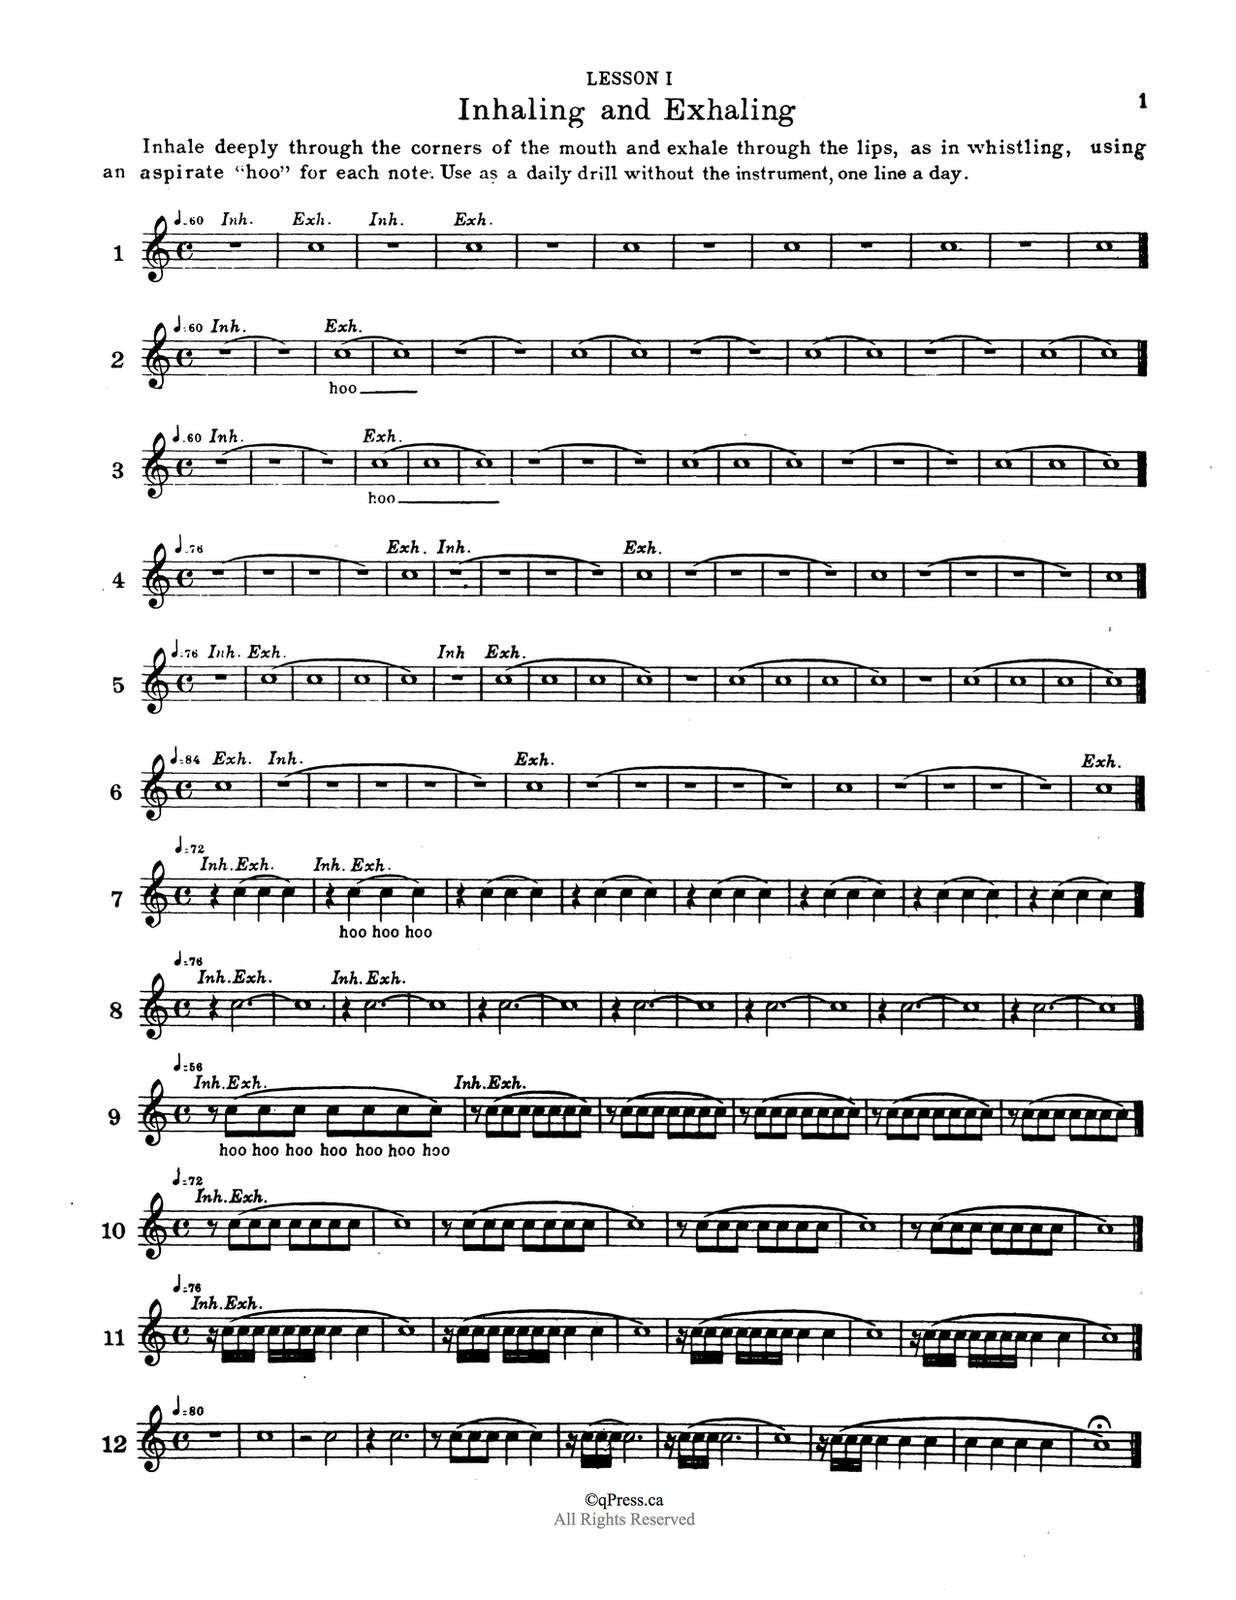 Eby, Walter Scientific Method for Trumpet Volume 1 4